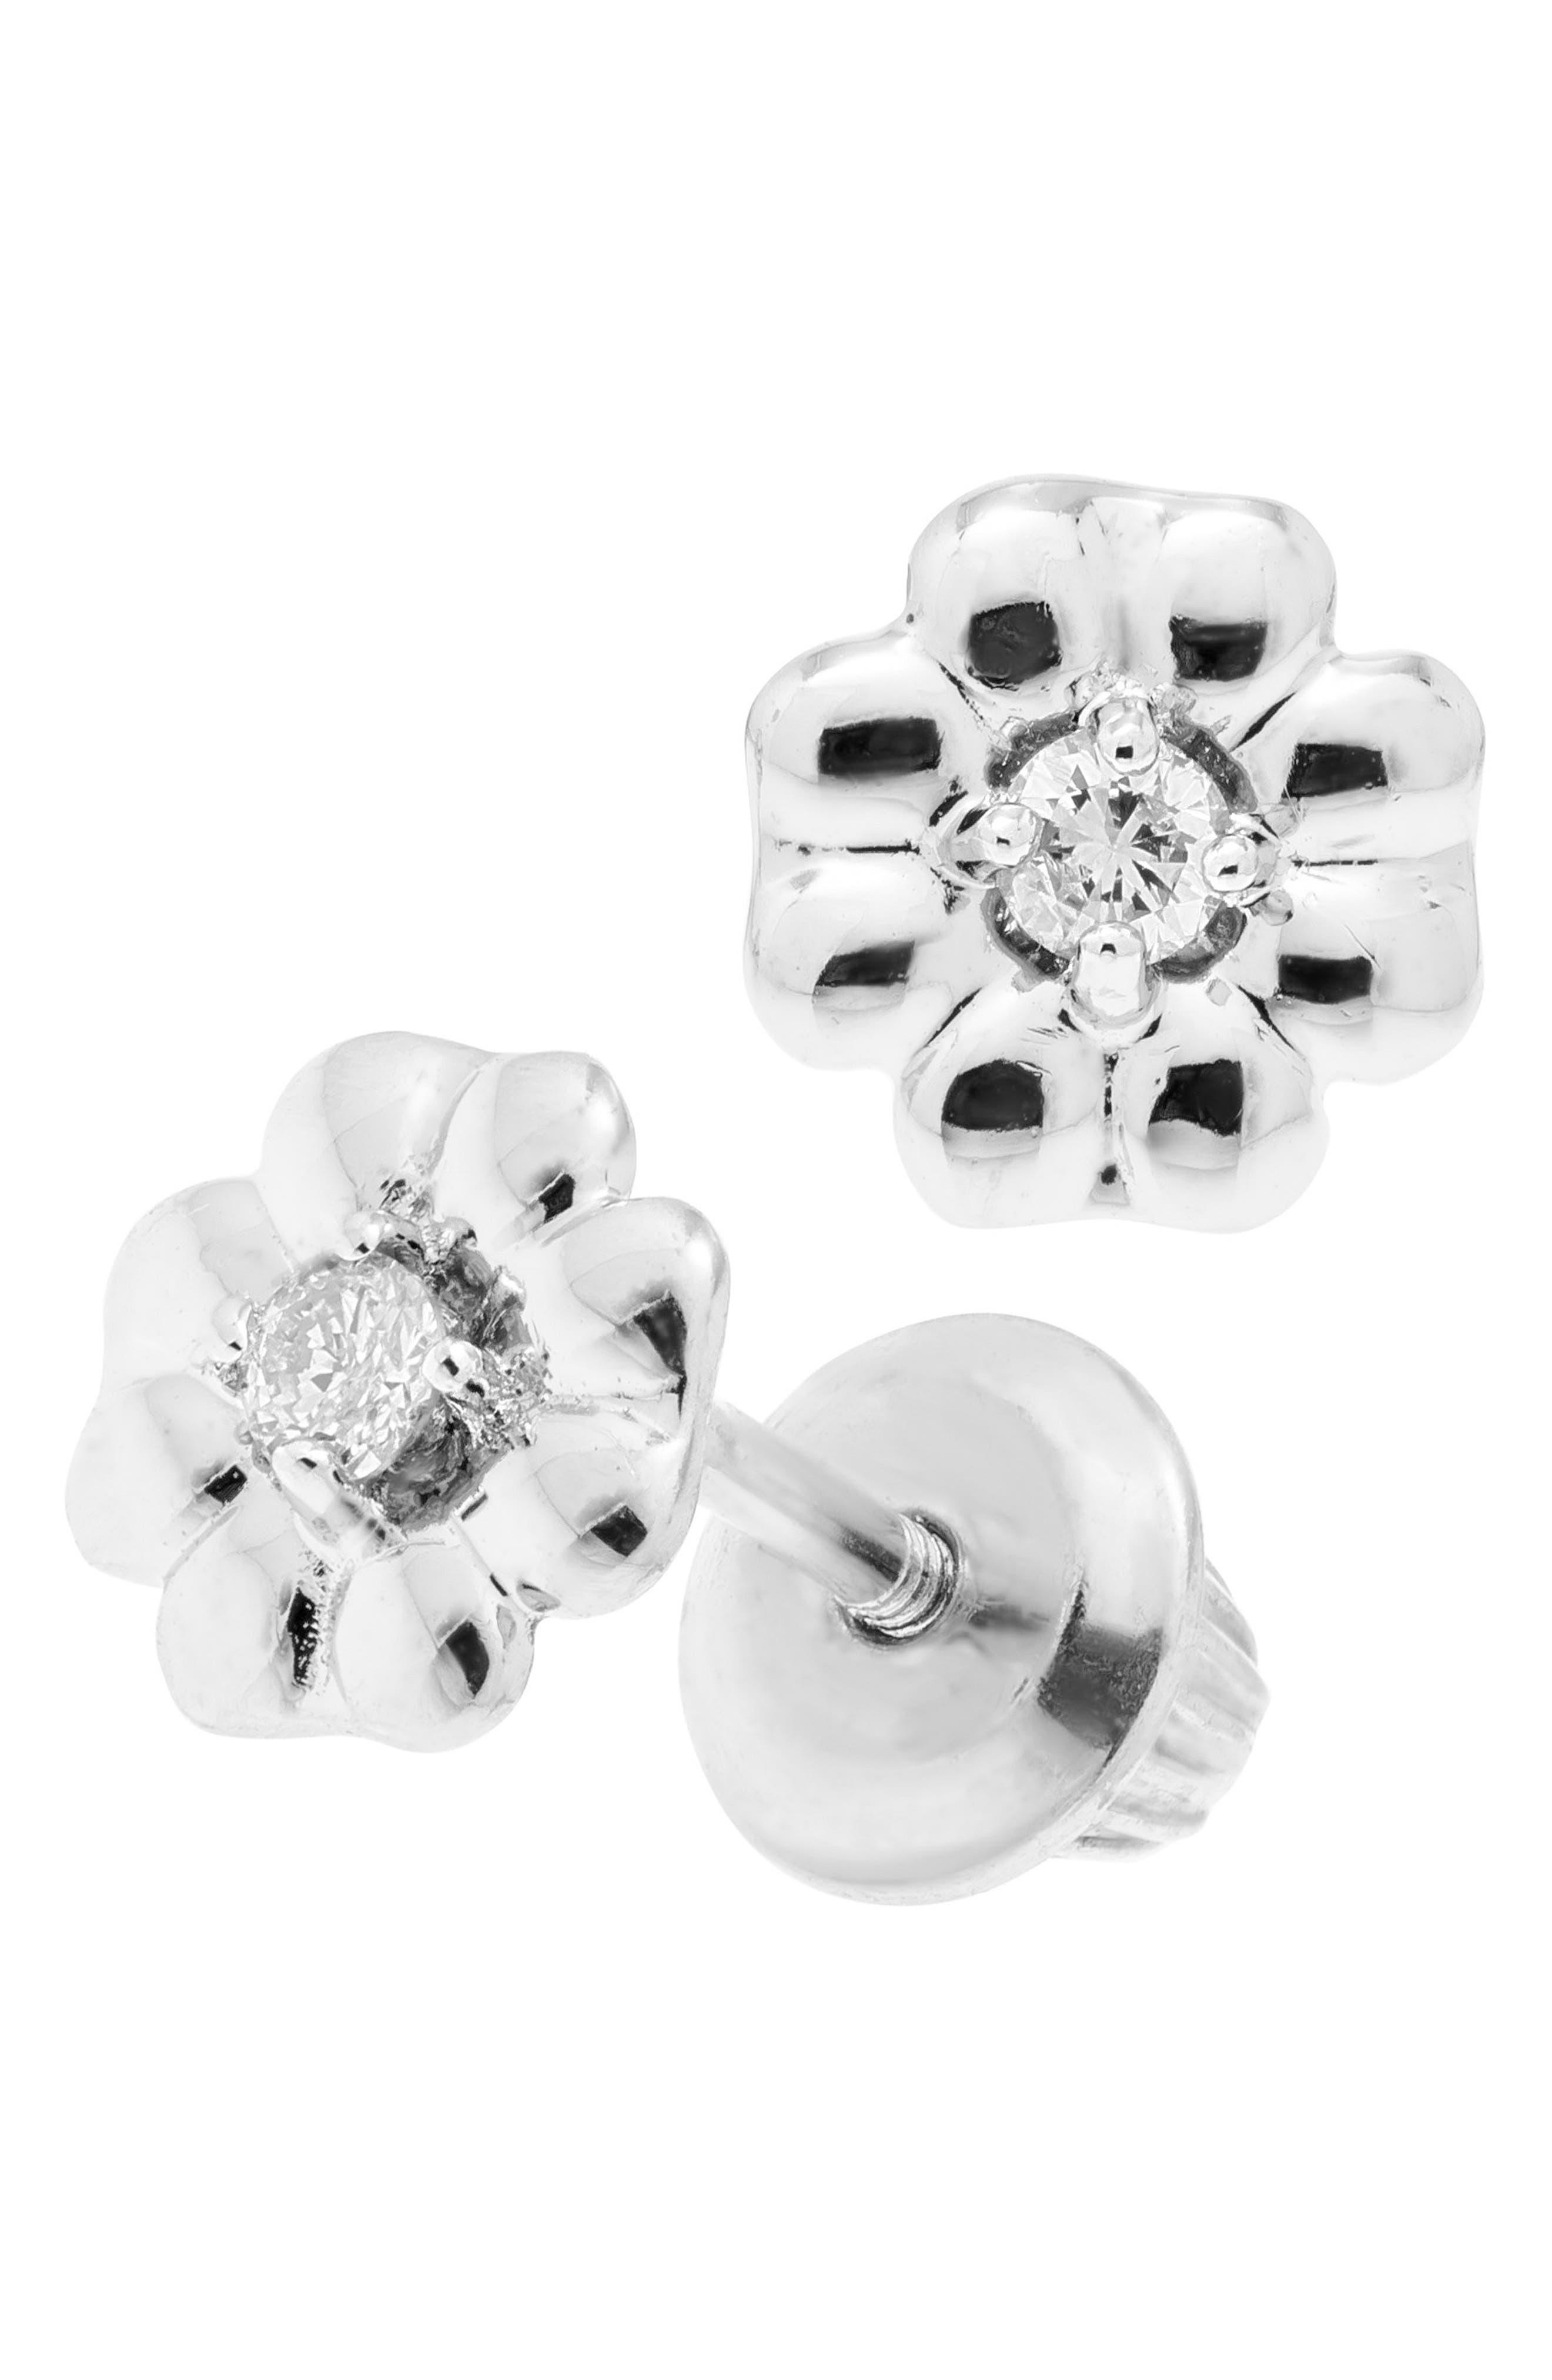 Sterling Silver & Diamond Stud Earrings,                             Main thumbnail 1, color,                             040